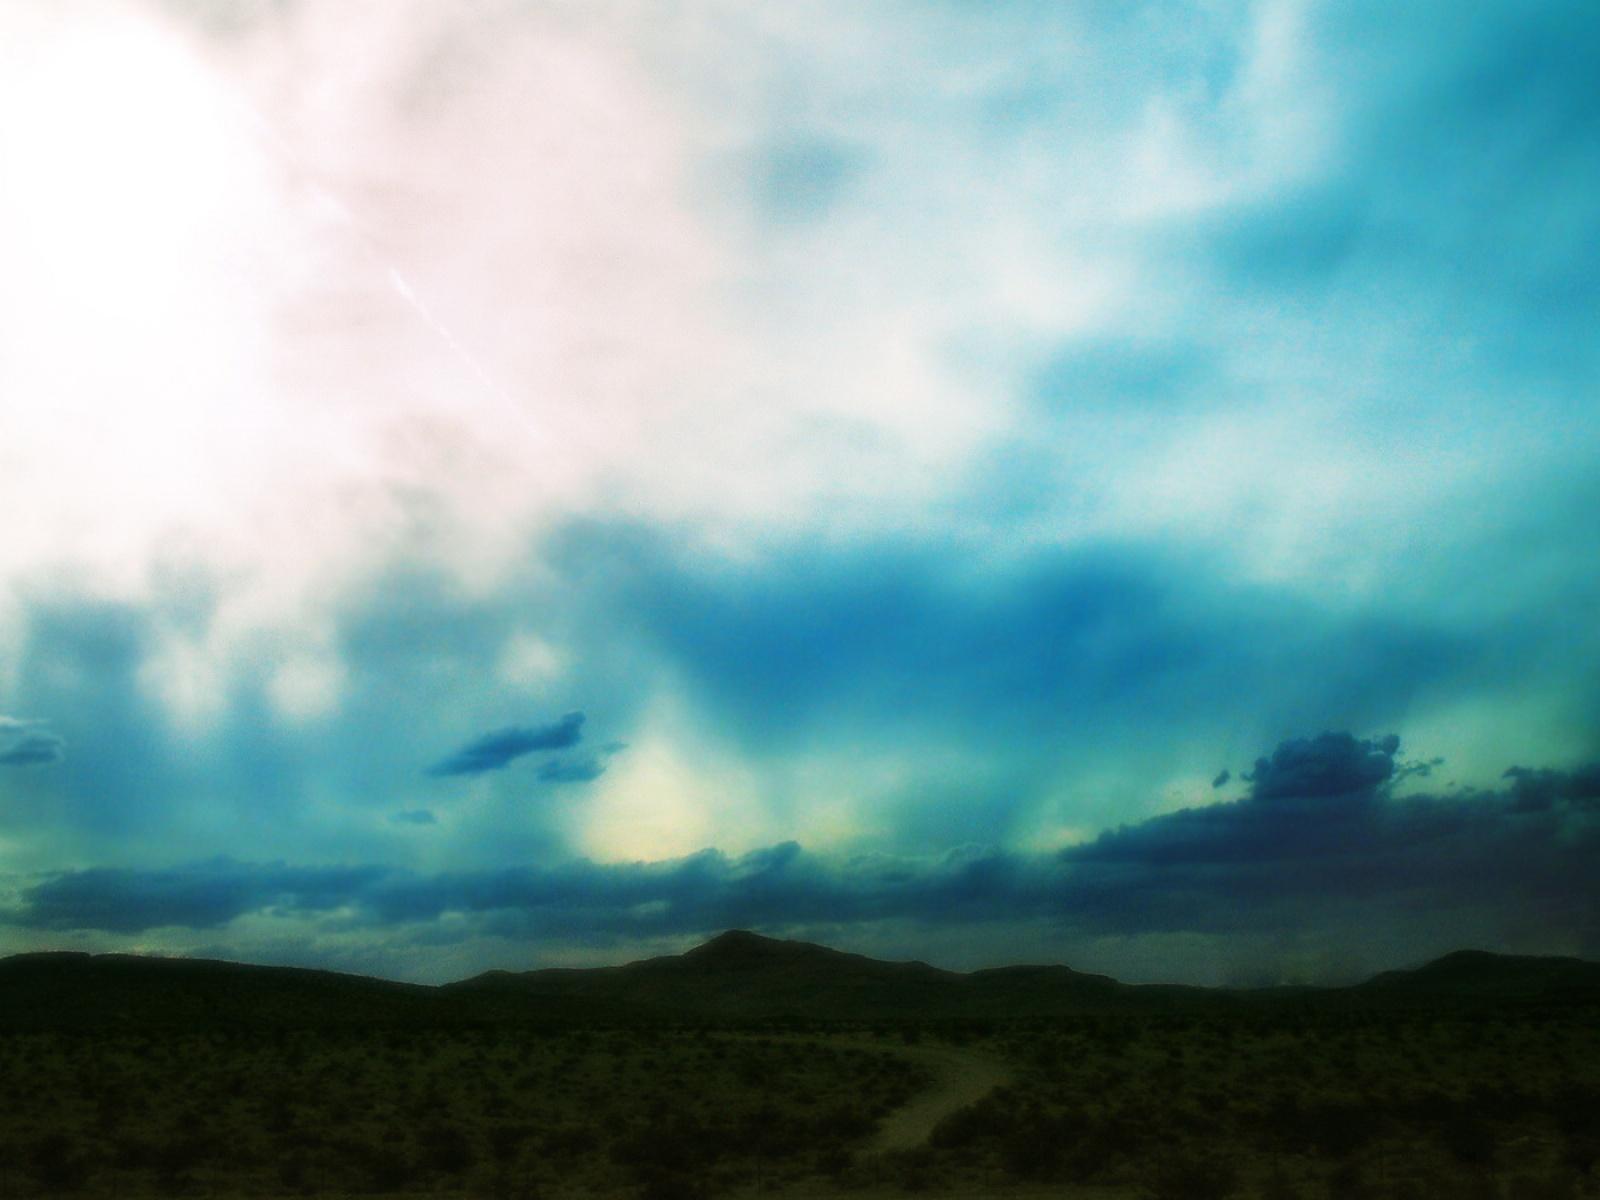 5550-ciel-nuageux-bleu-cyan-viaa